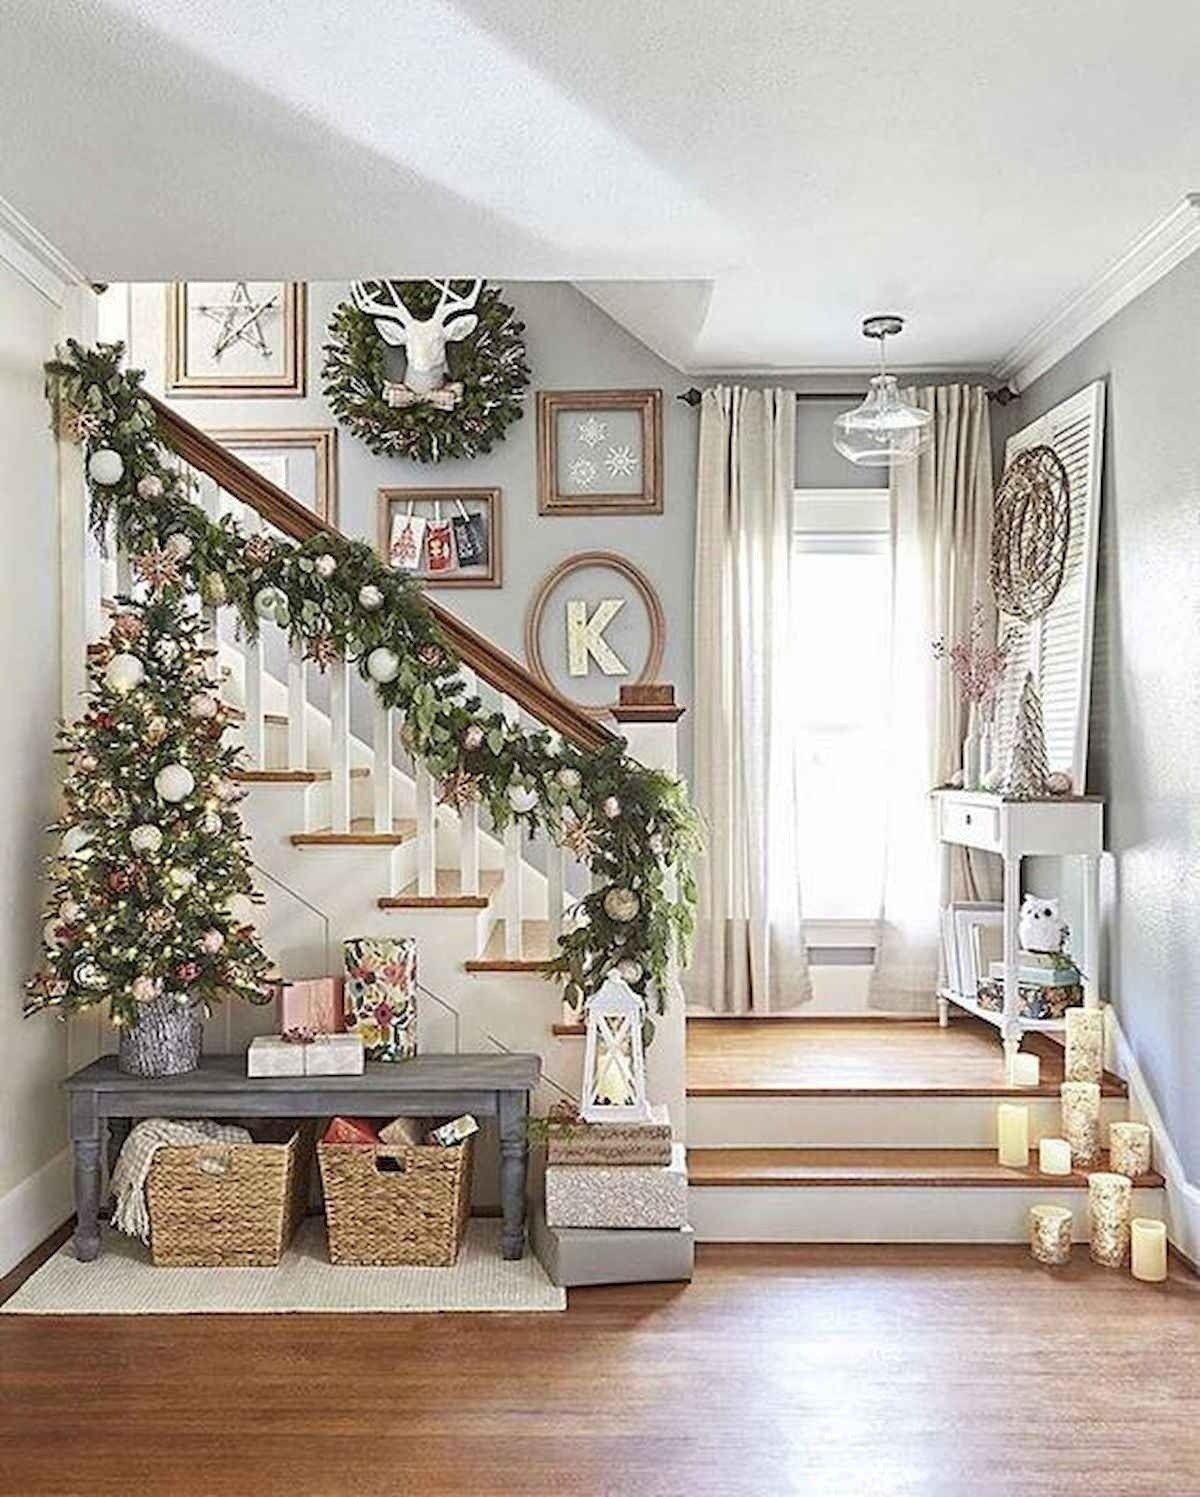 60 Simple Living Room Christmas Decor Ideas Chris